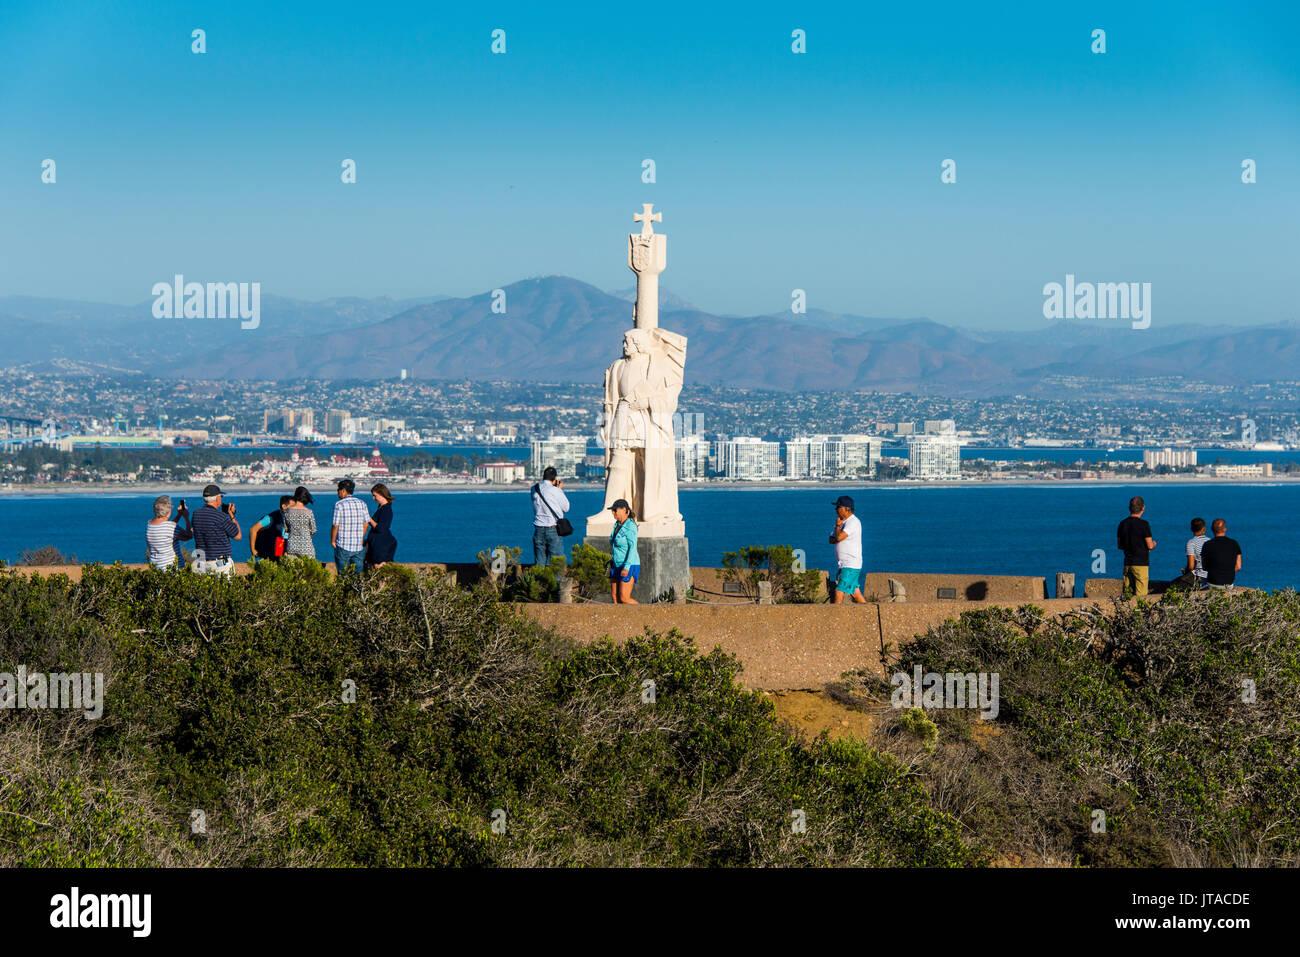 Cabrillo Statue, Cabrillo National Monument, Point Loma, San Diego, California, United States of America, North - Stock Image